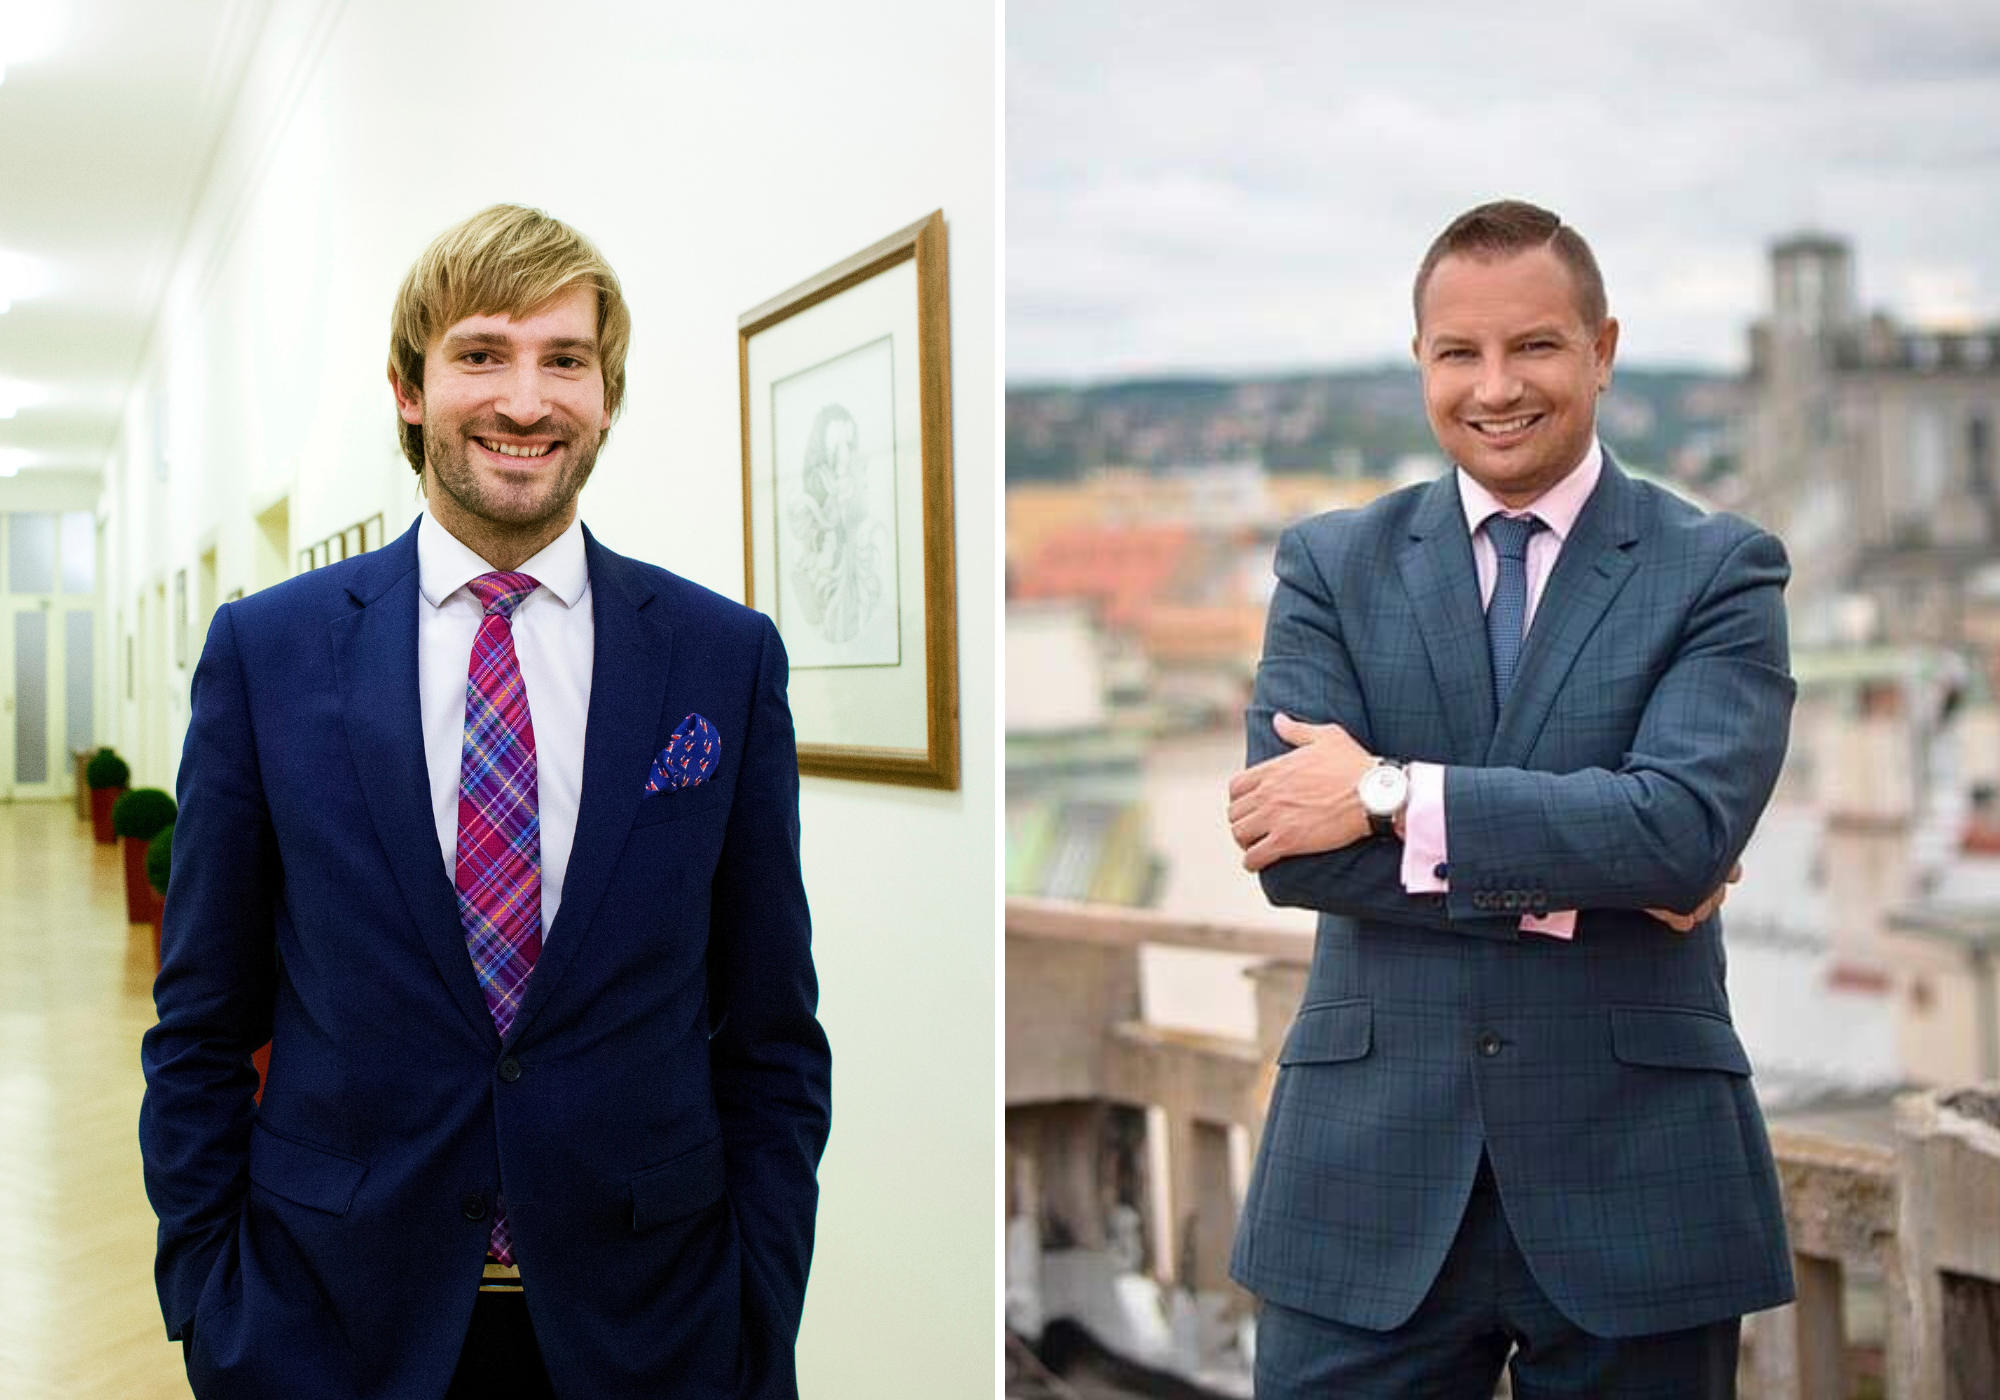 Ministr zdravotnictví Adam Vojtěch (ANO) a lobbista Tomáš Horáček (vpravo).